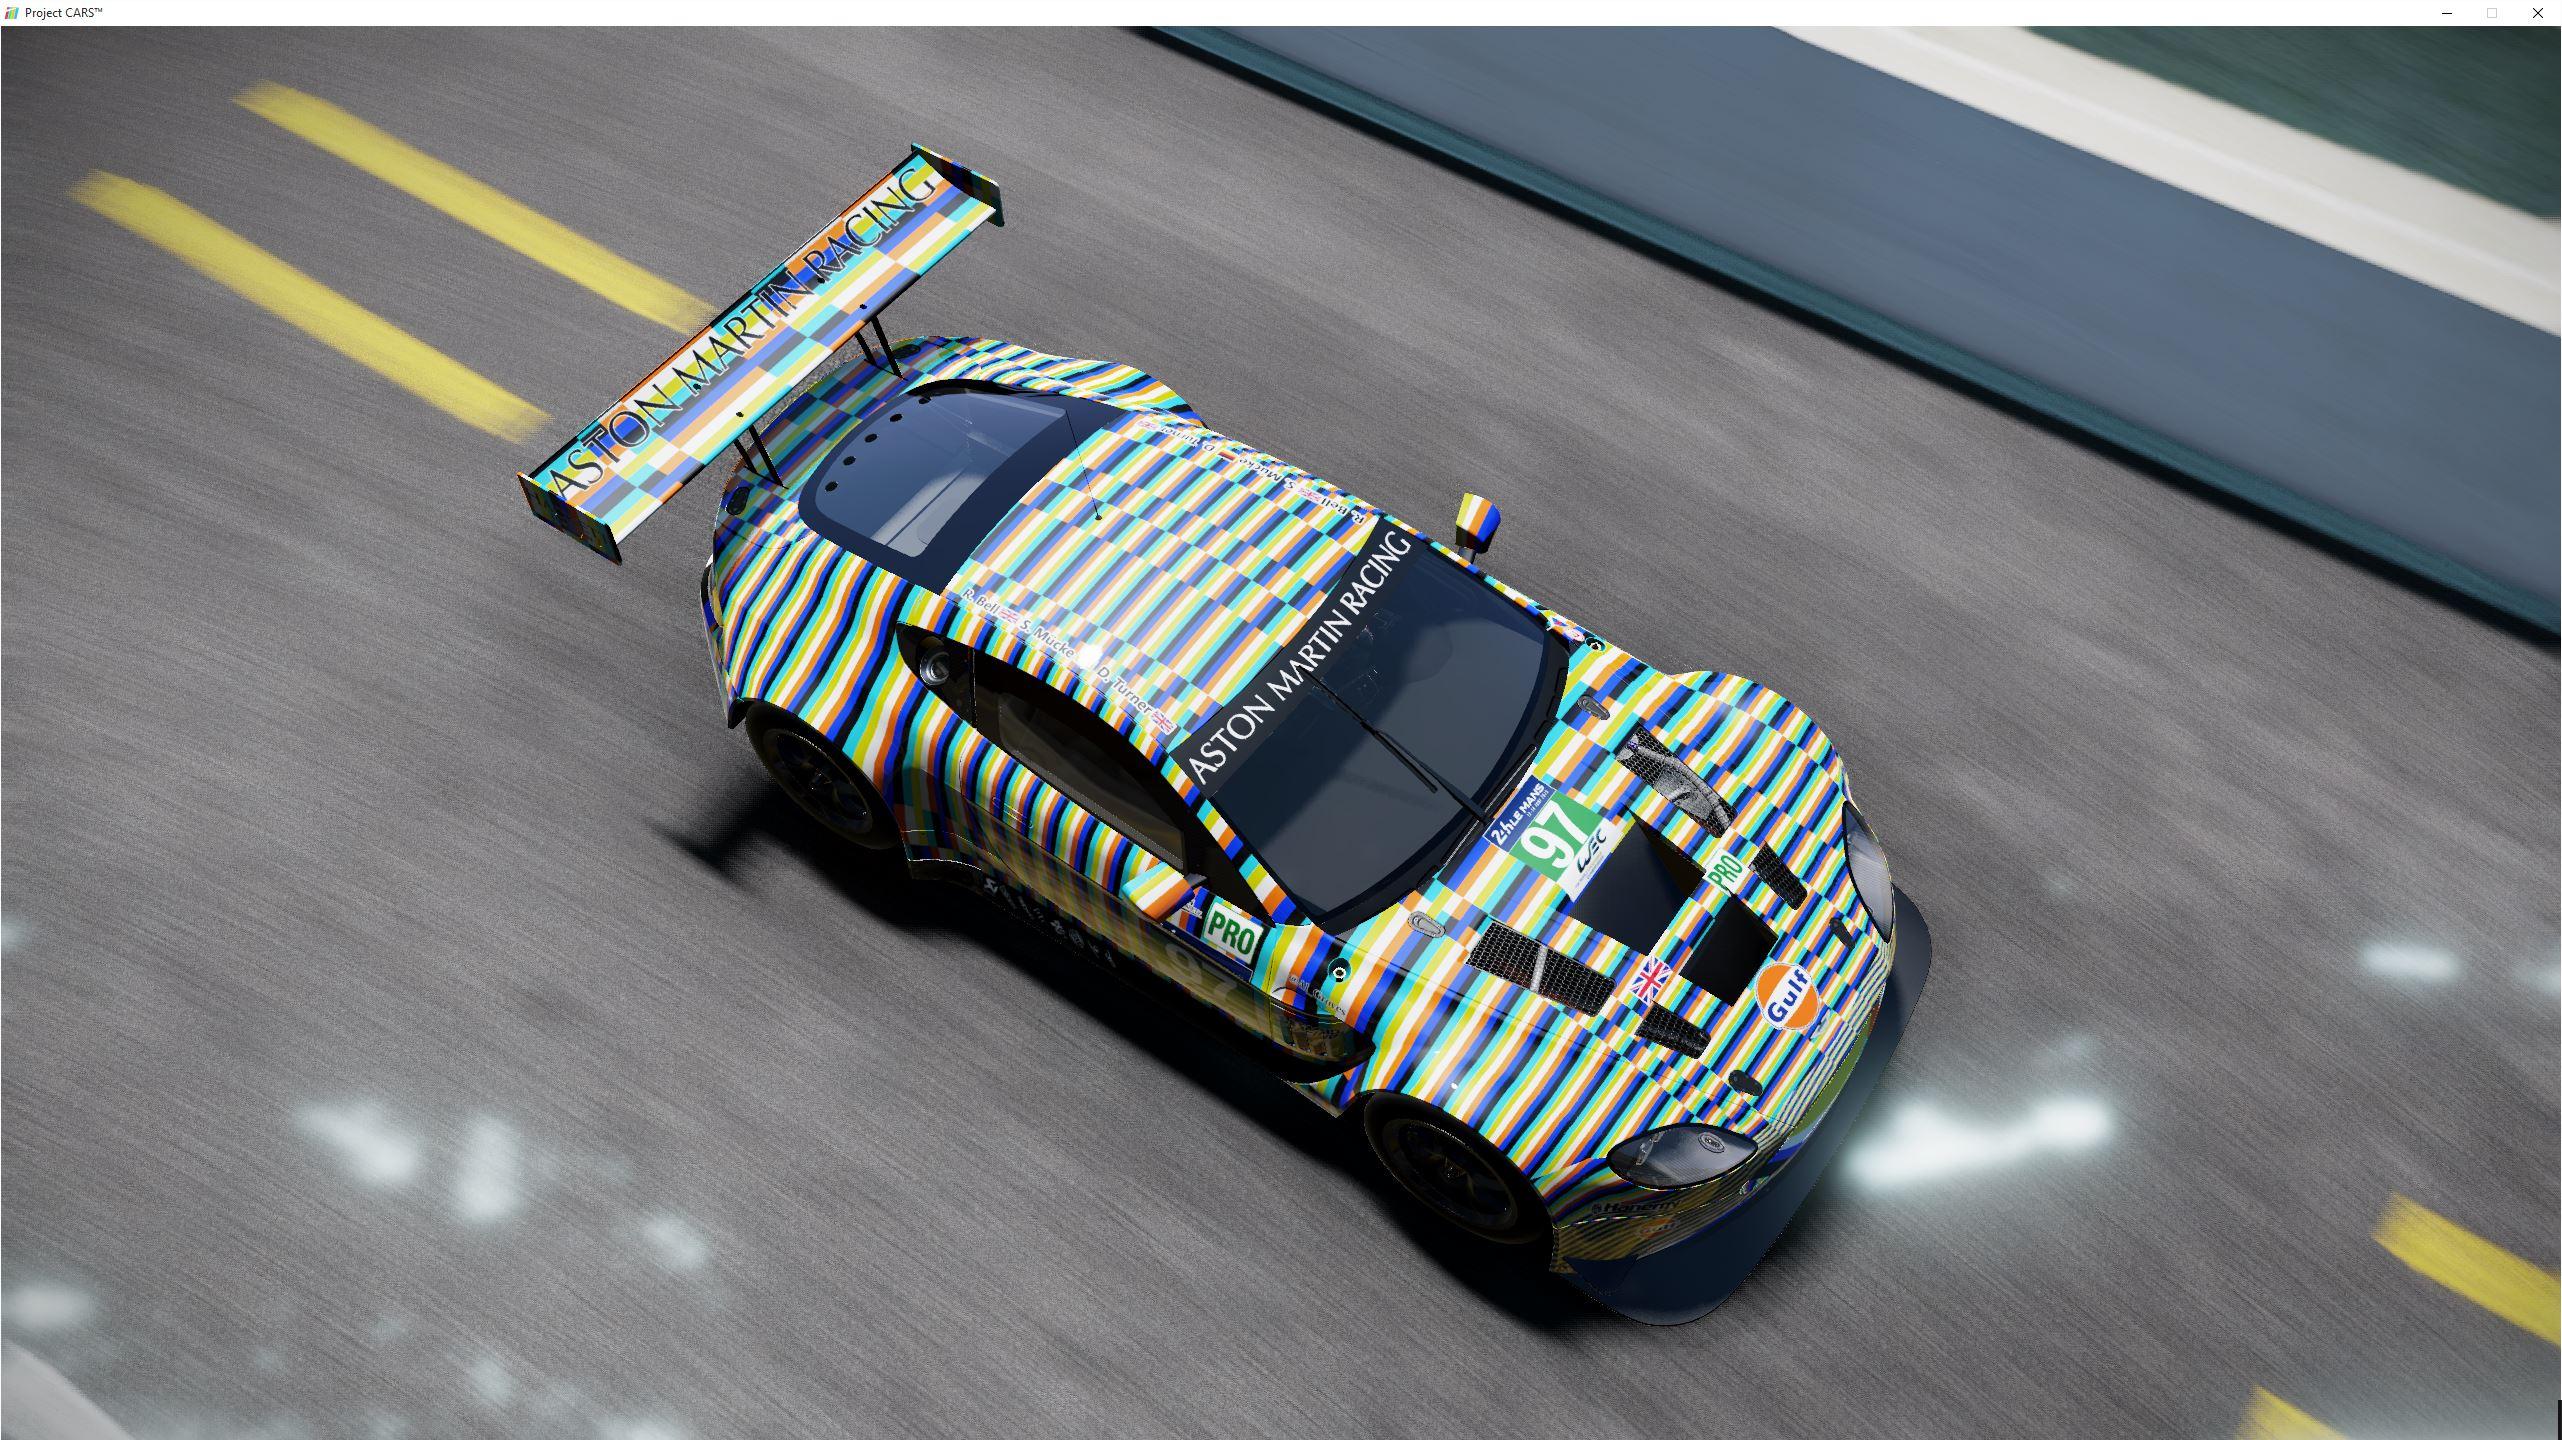 Aston Martin 2015 Le Mans Art Car - Aston Martin 2015 Le Mans Art Car - mirrors and sideboards ...